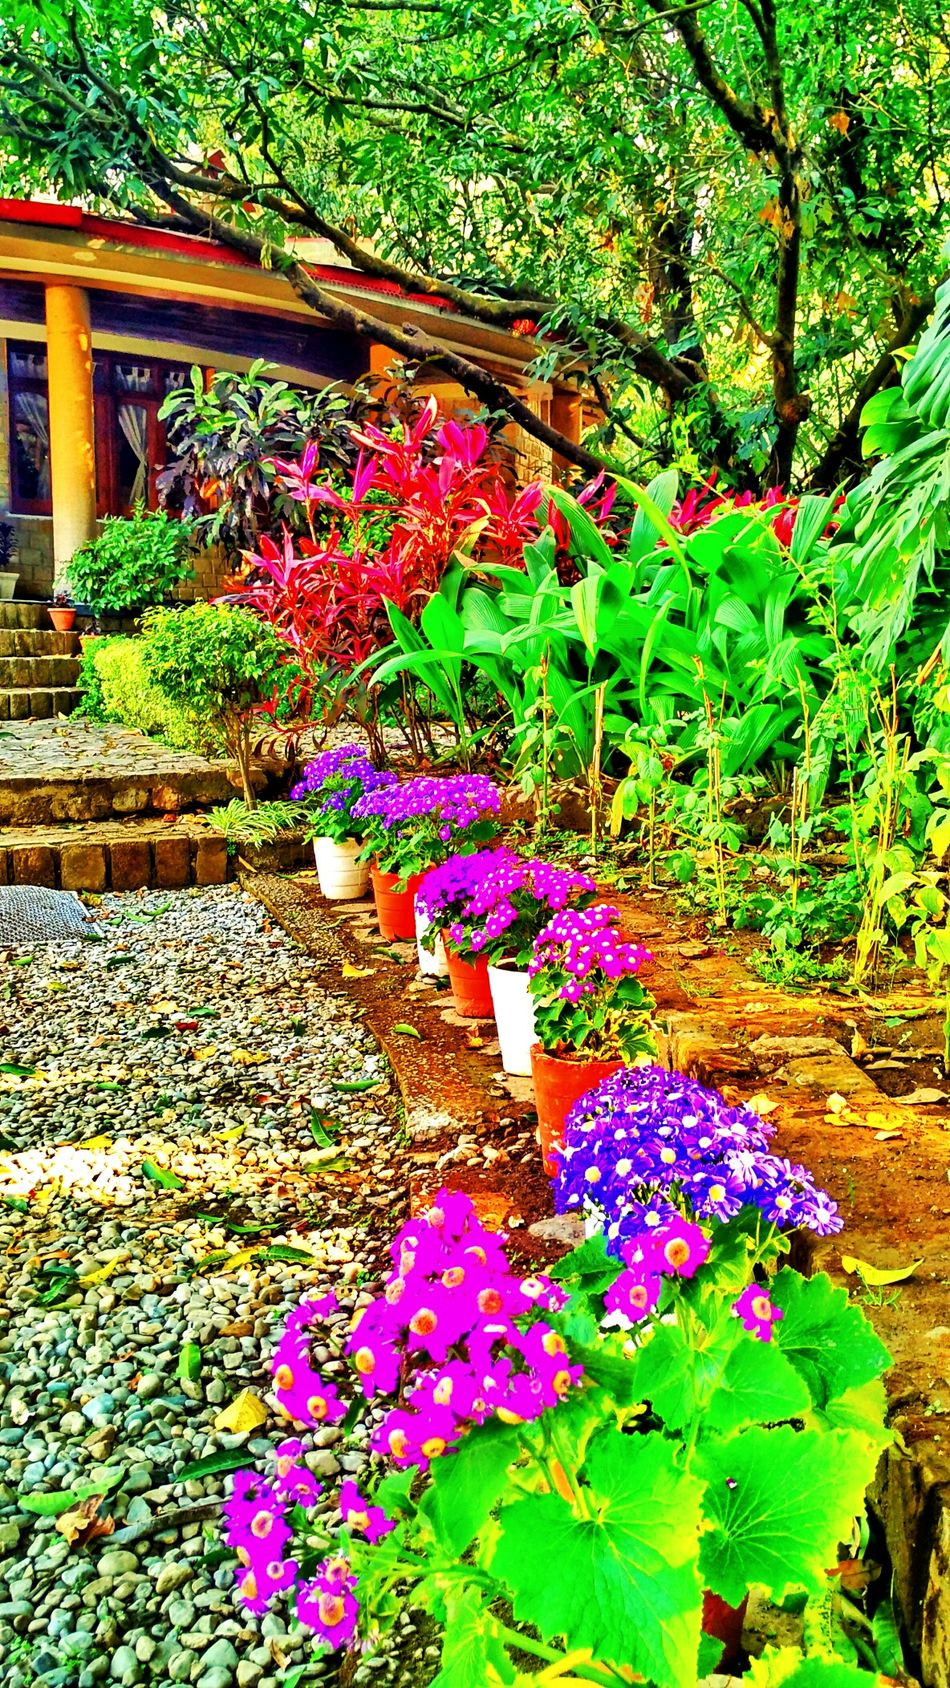 Vibrant Flowers Saturated Jim Corbett The Den Resort Vivid